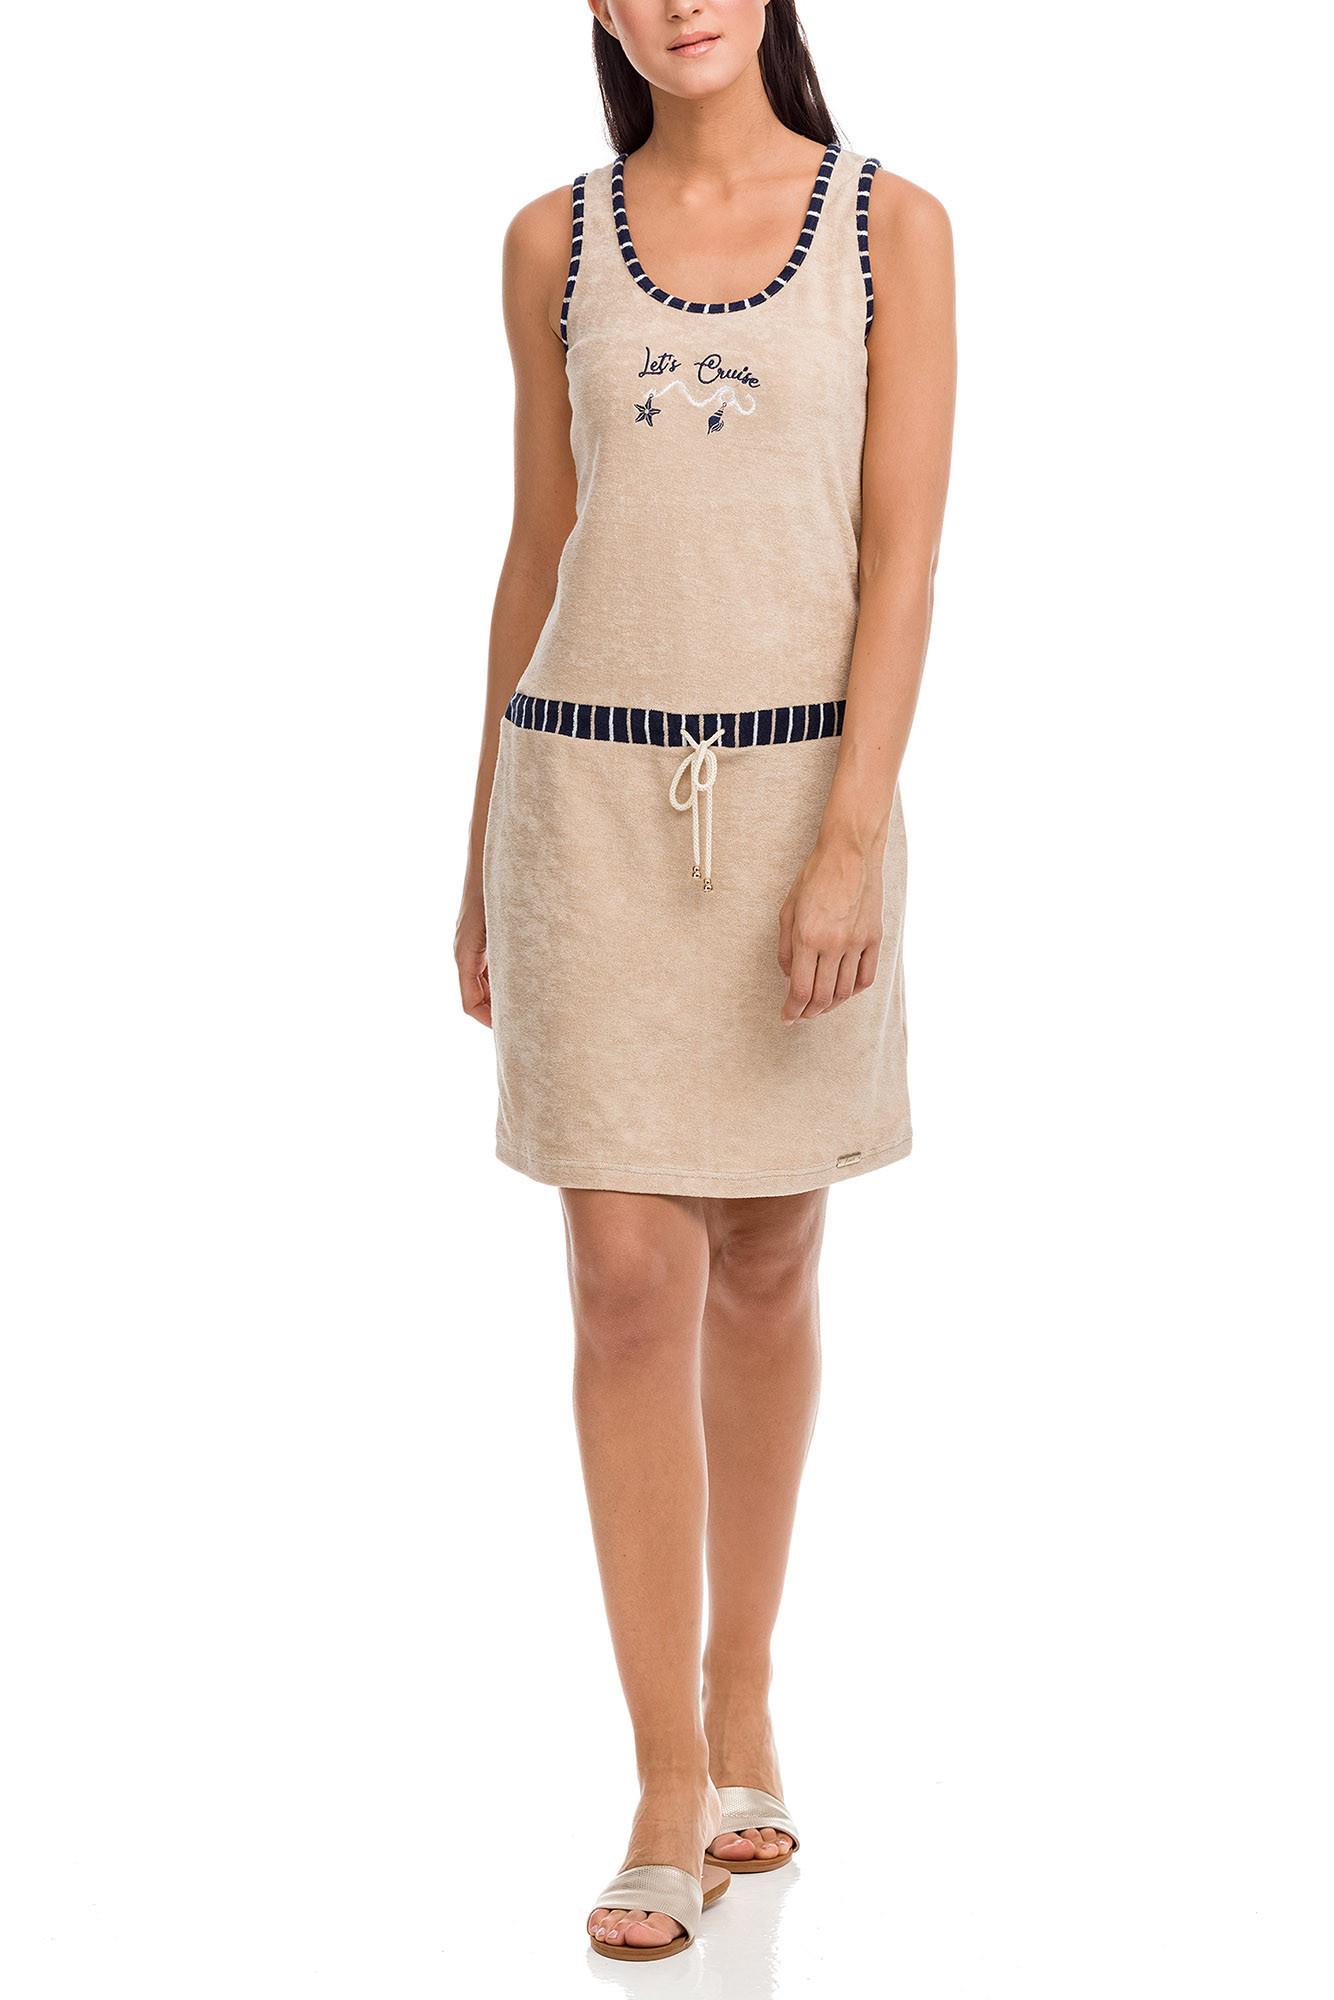 Vamp - Dámske šaty 12578 - Vamp beige peach l